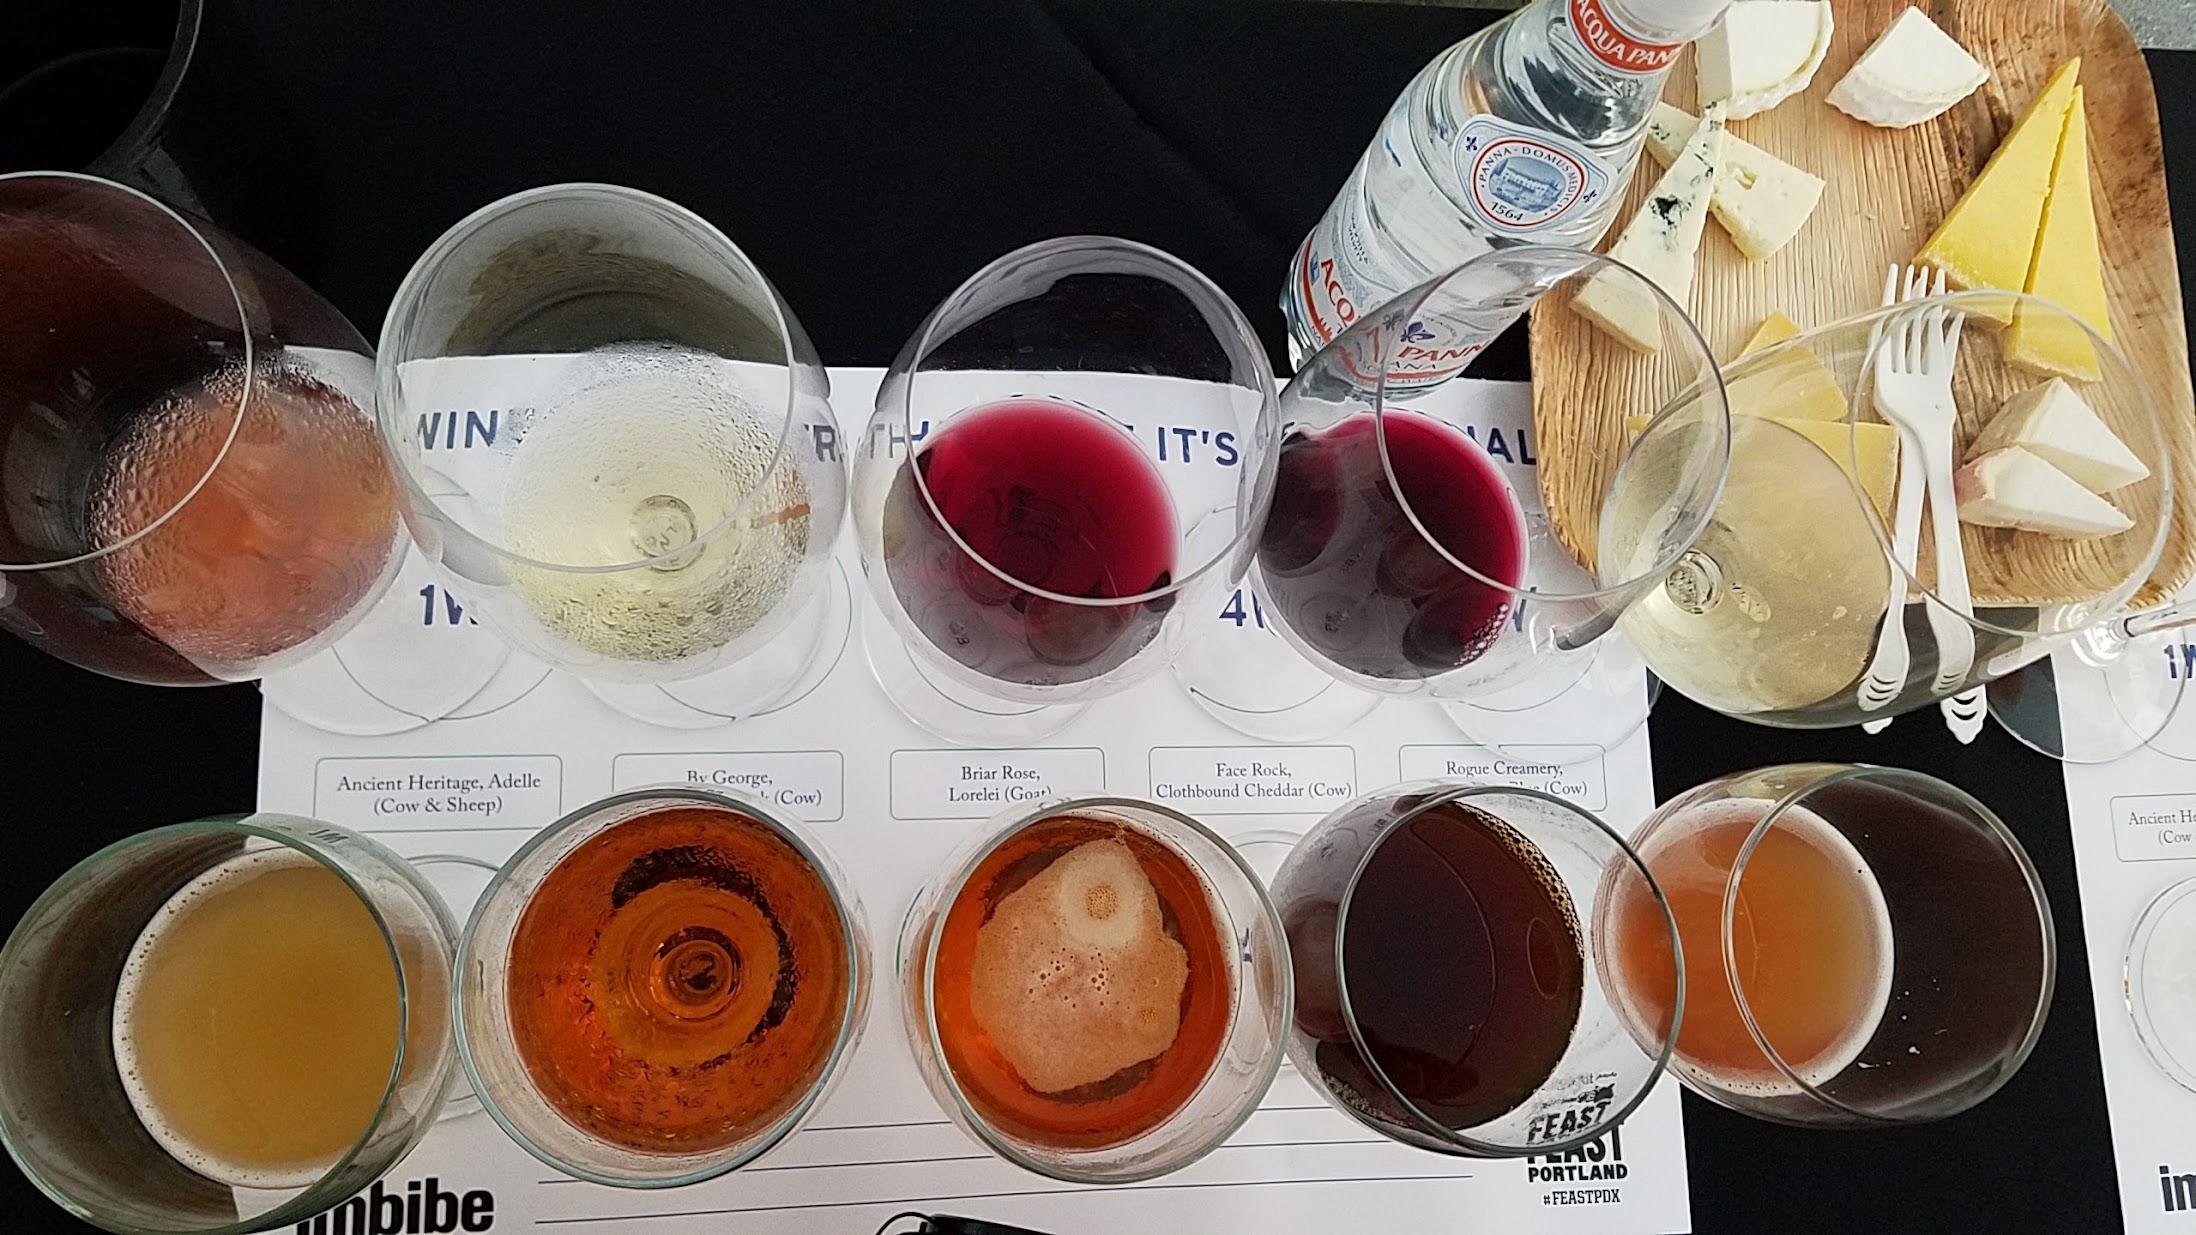 Feast Portland - Drink Tank 2016: Wine Vs Beer Pairing with Cheese